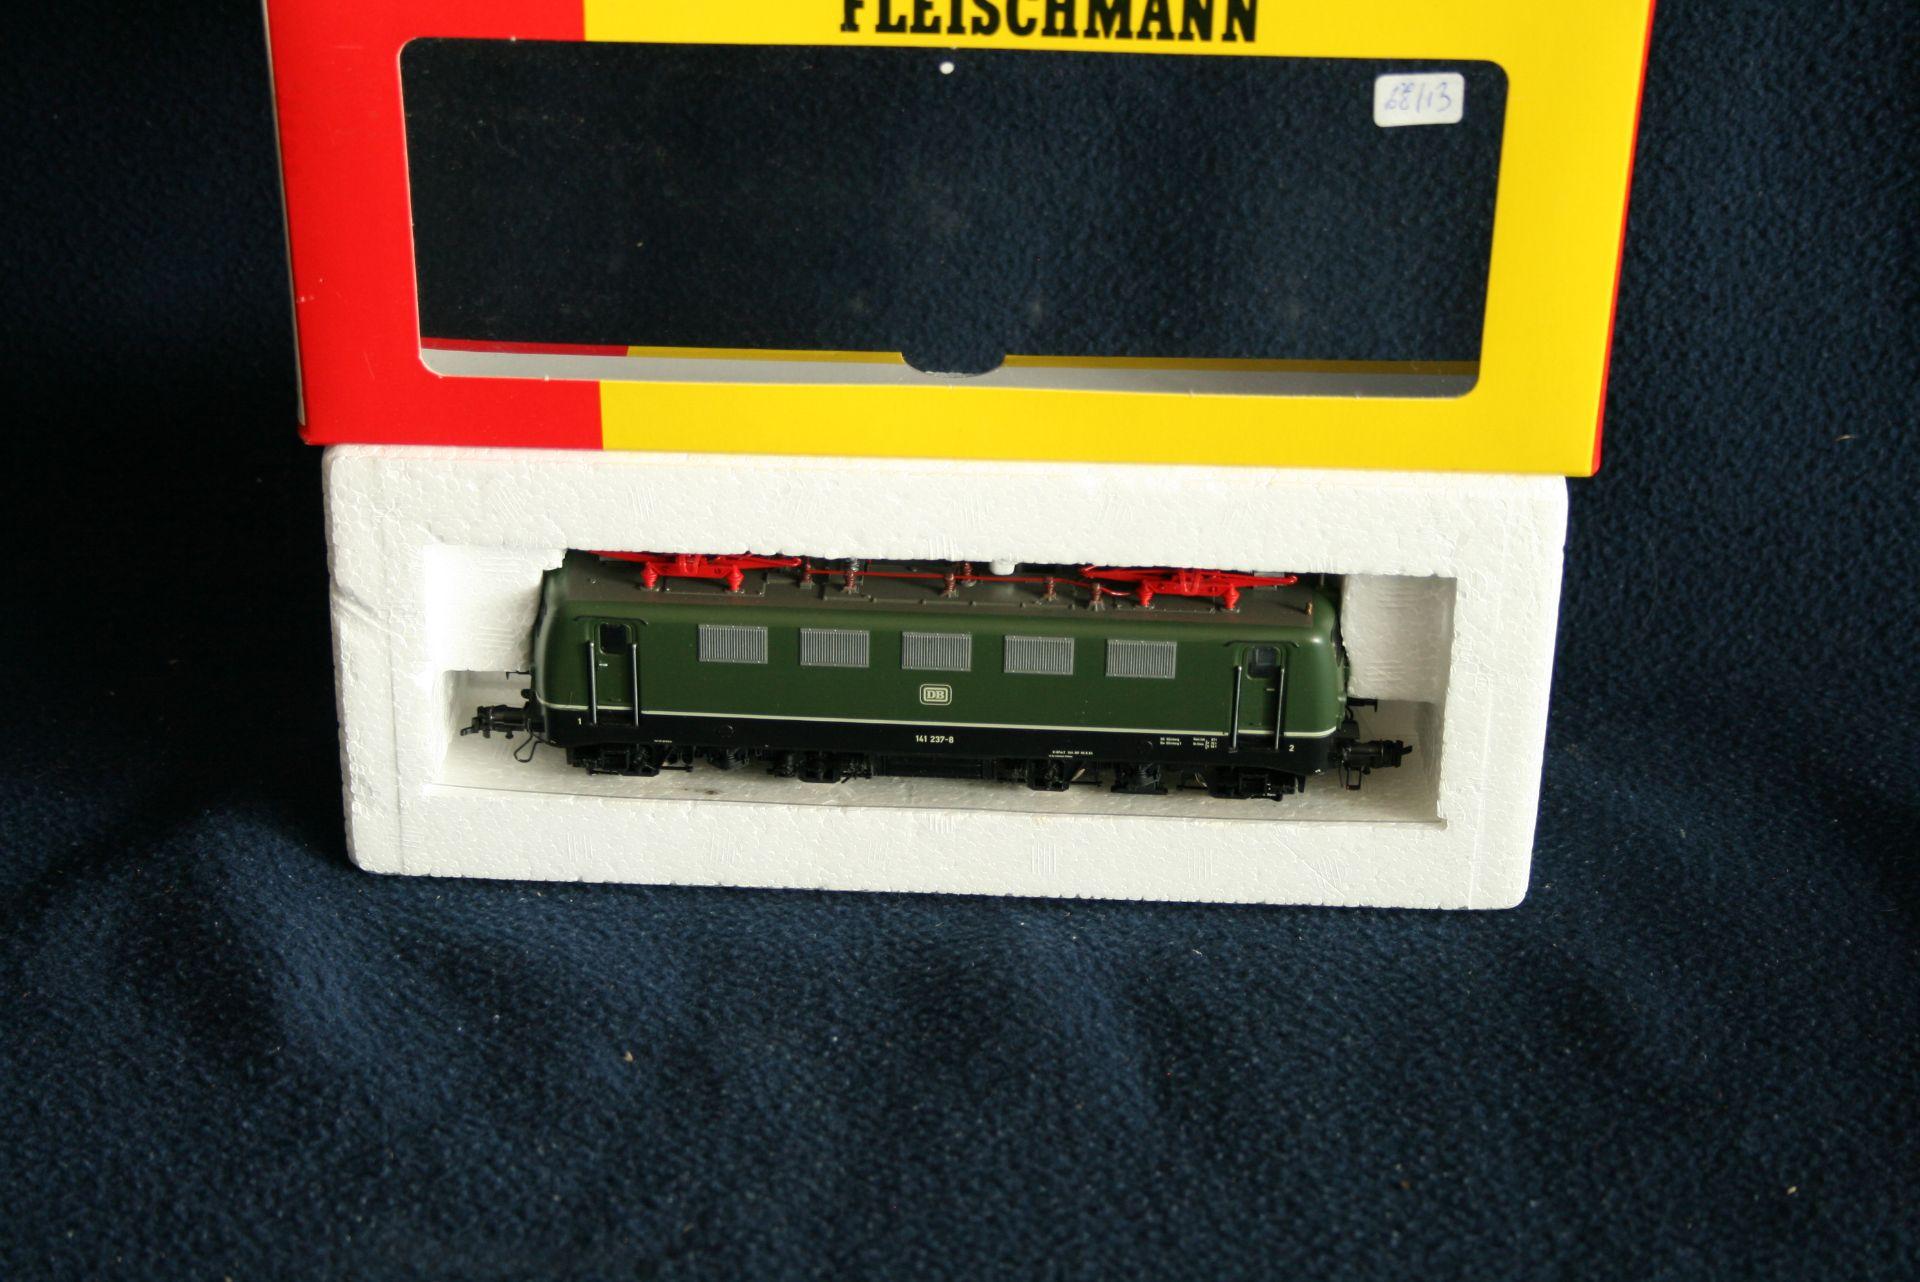 FLEISCHMANN HO - 4326 - 141 237-8, boîte d'origine - - FLEISCHMANN HO - 4326 - [...]